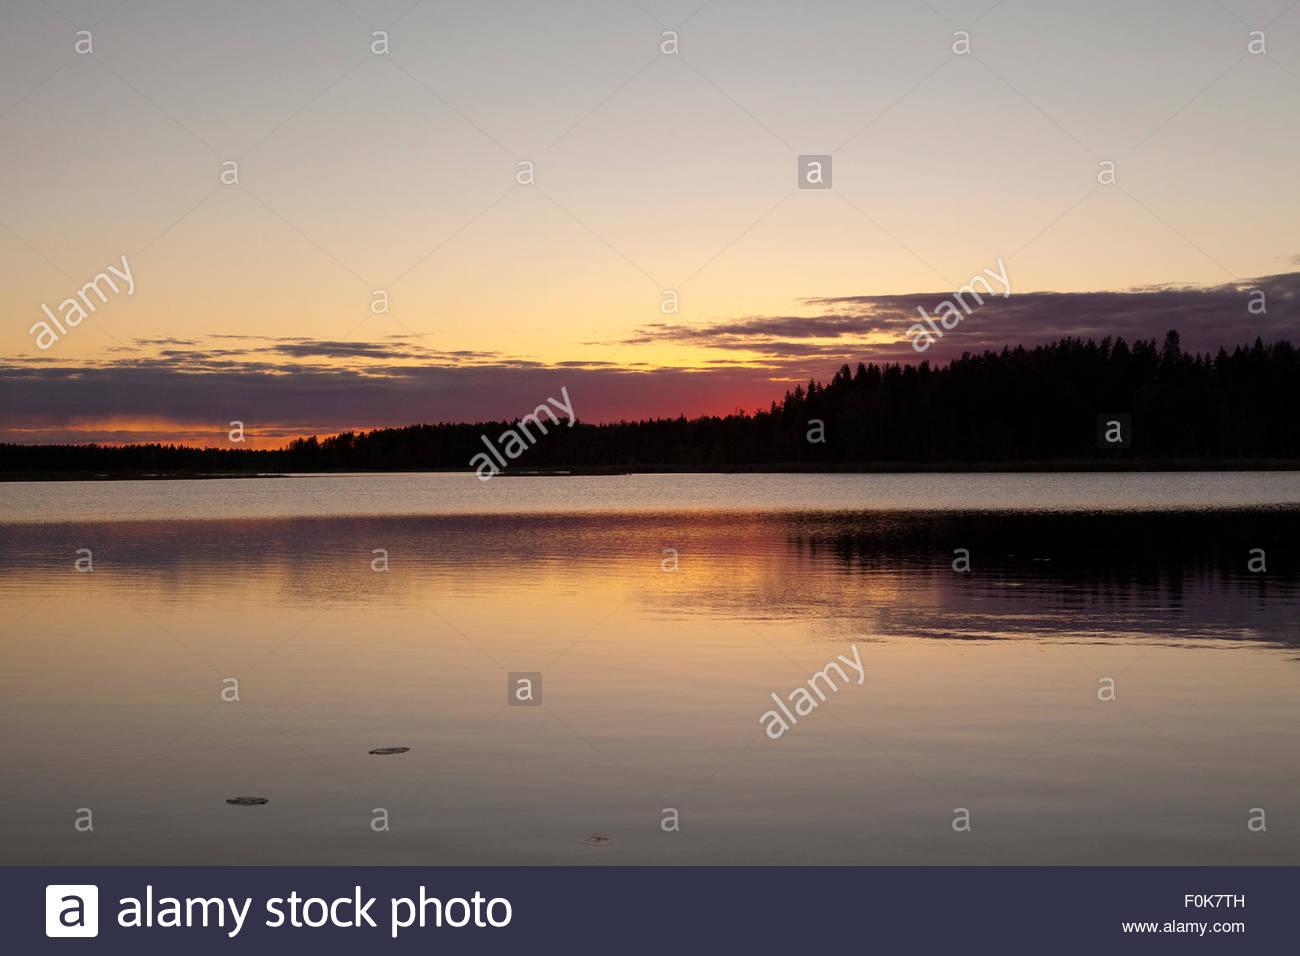 Quiet evening at lake Koskeljärvi Finland - Stock Image